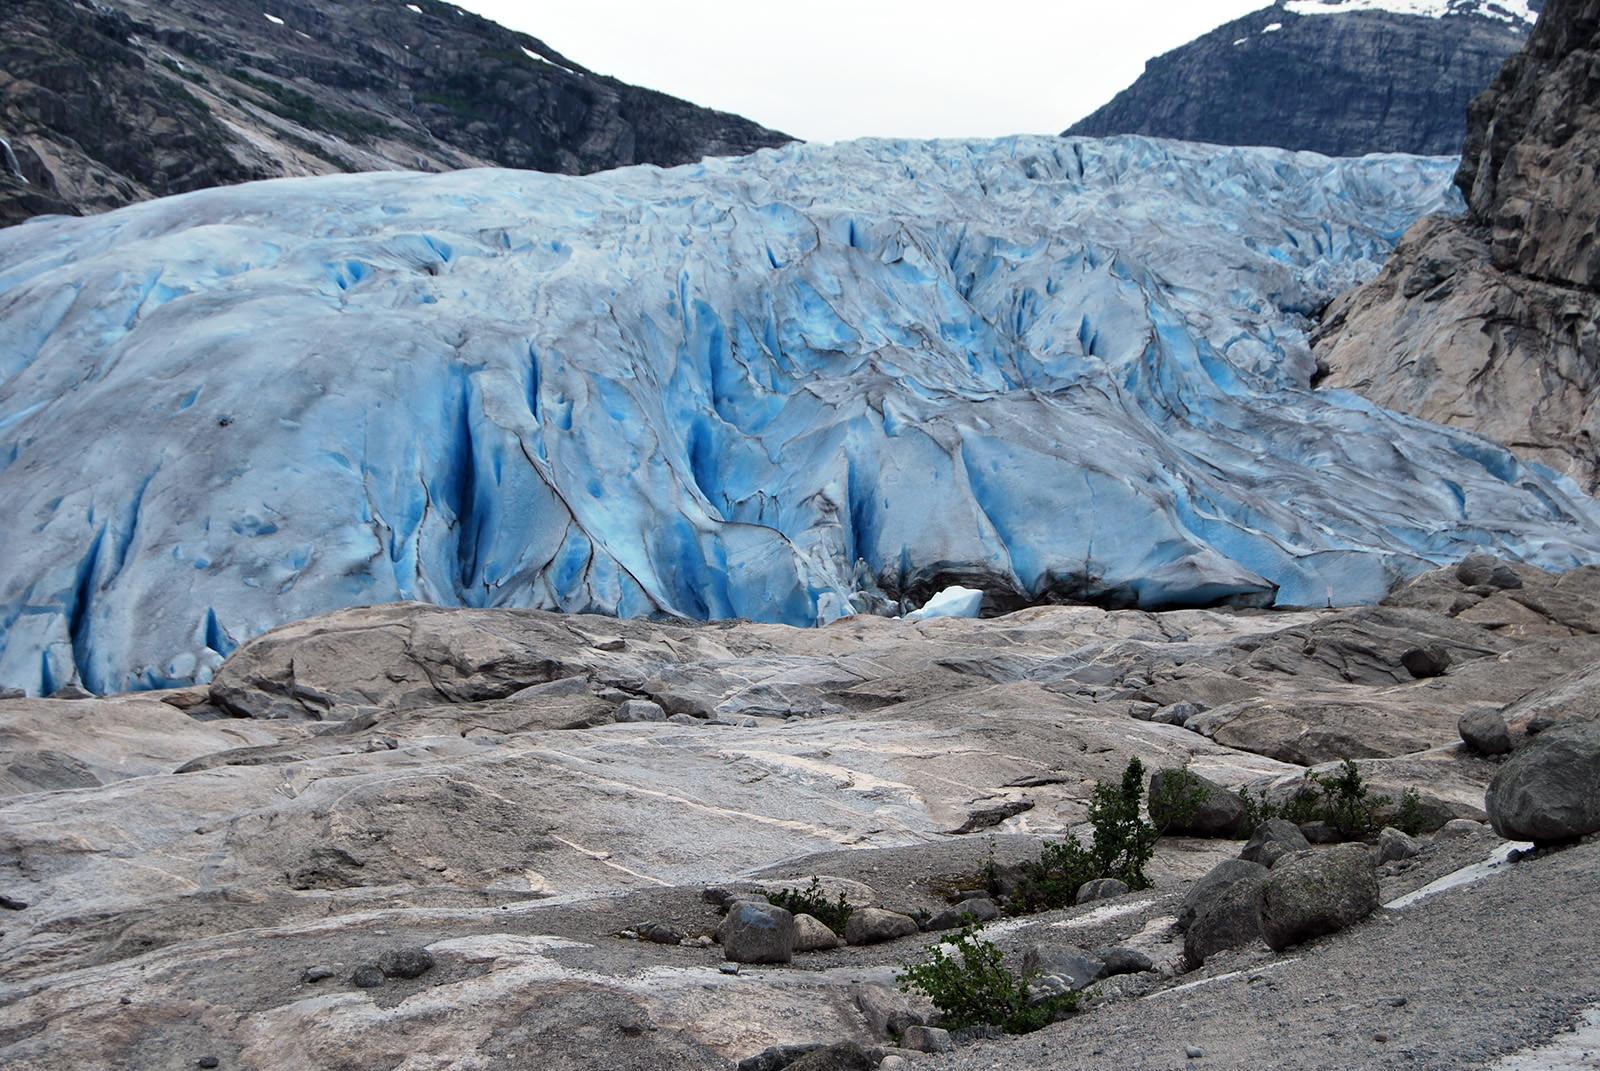 ледник Нигардсбреен Необычные маршруты Норвегии